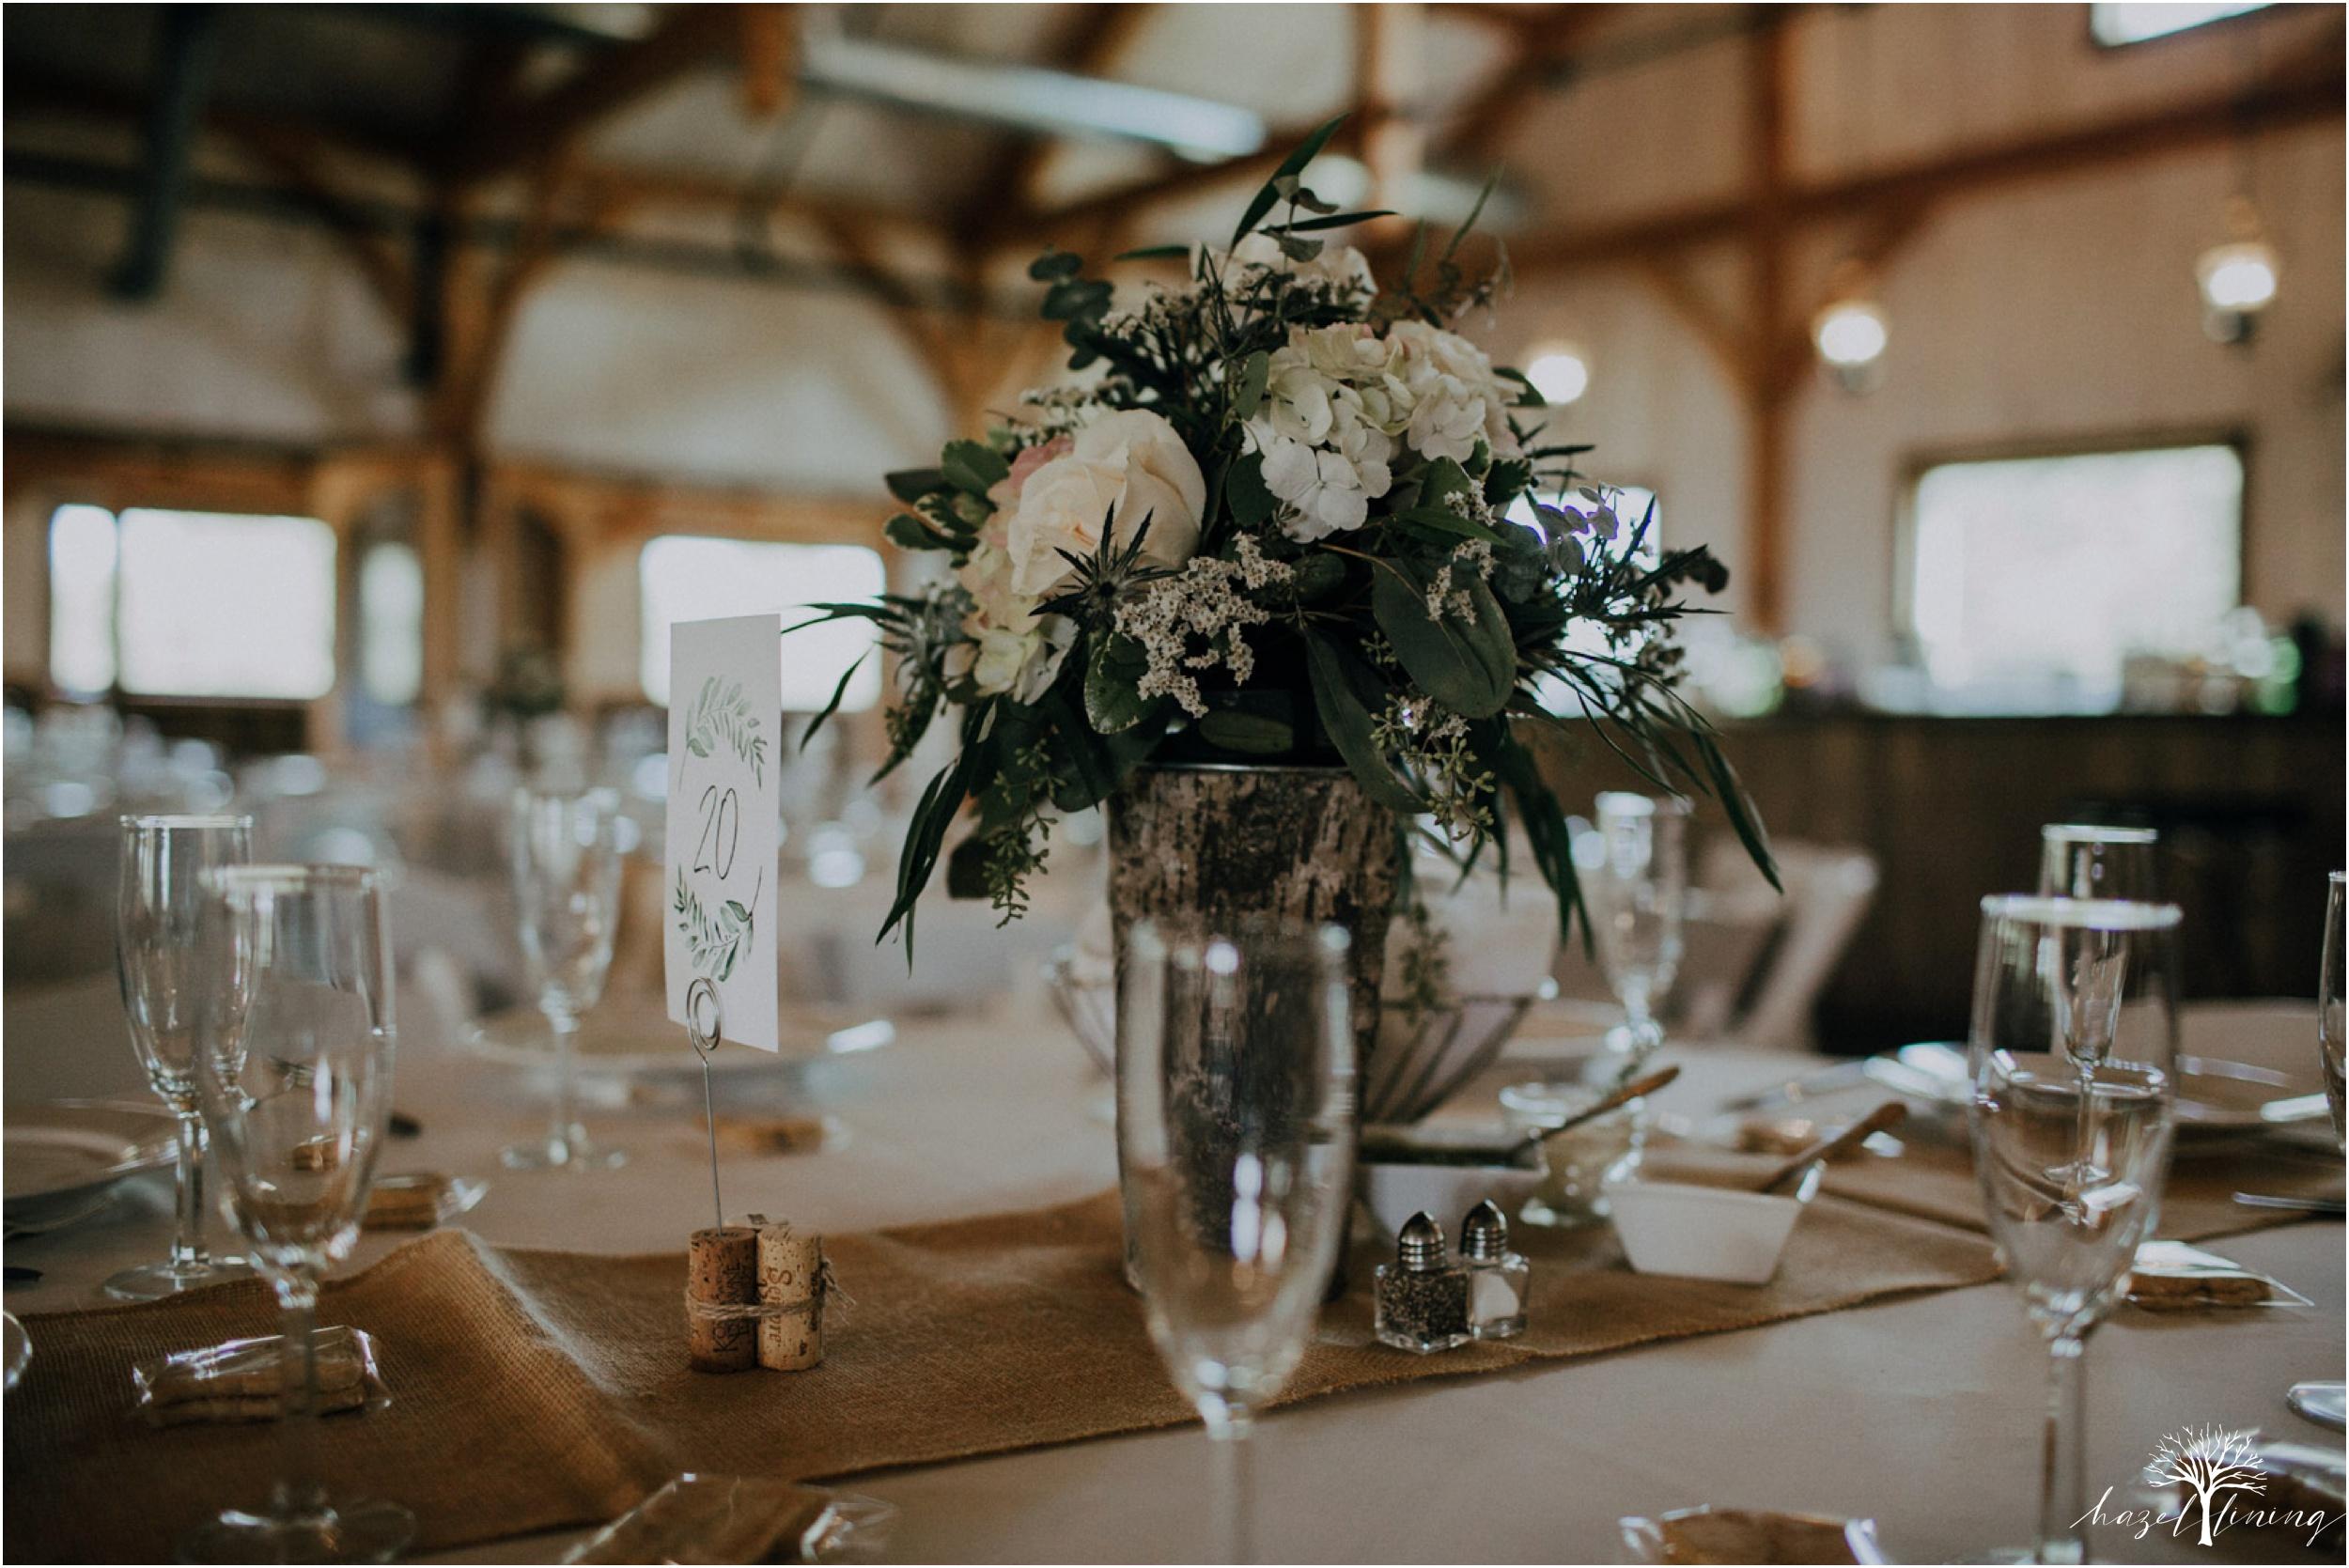 maureen-hepner-anthony-giordano-rose-bank-winery-newtow-pennsylvania-luxury-summer-wedding-hazel-lining-photography-destination-elopement-wedding-engagement-photography_0125.jpg